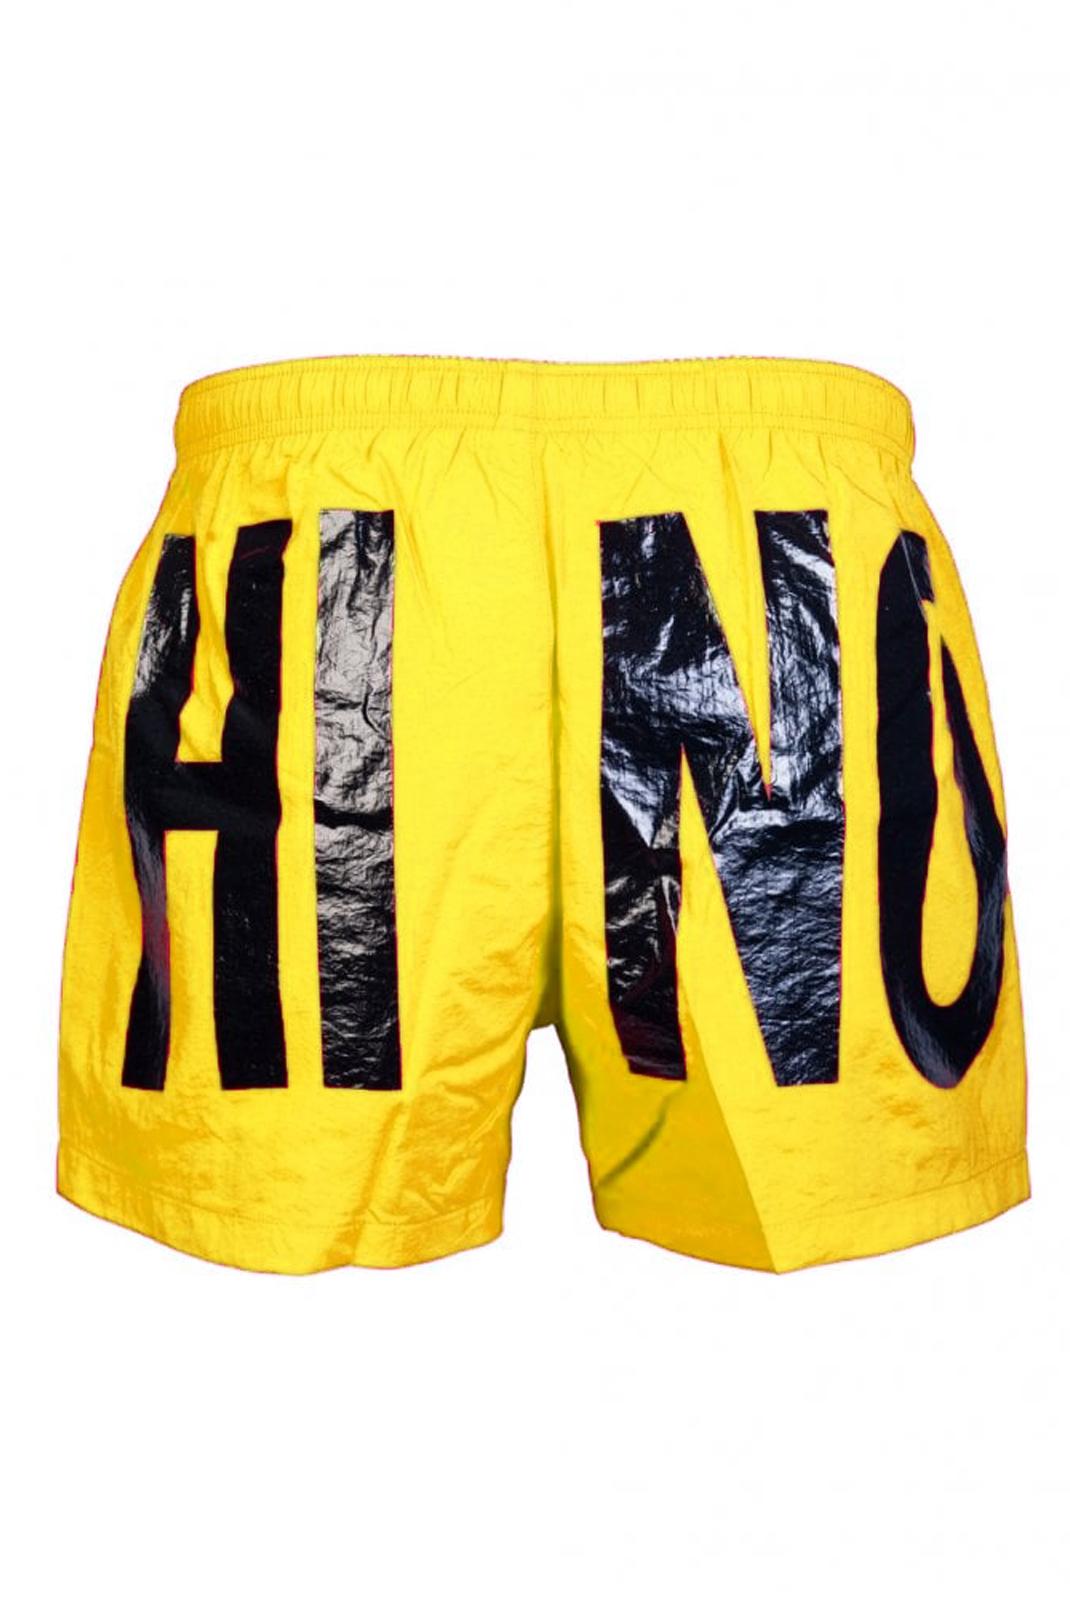 Shorts de bain  Moschino V6119 0028 JAUNE